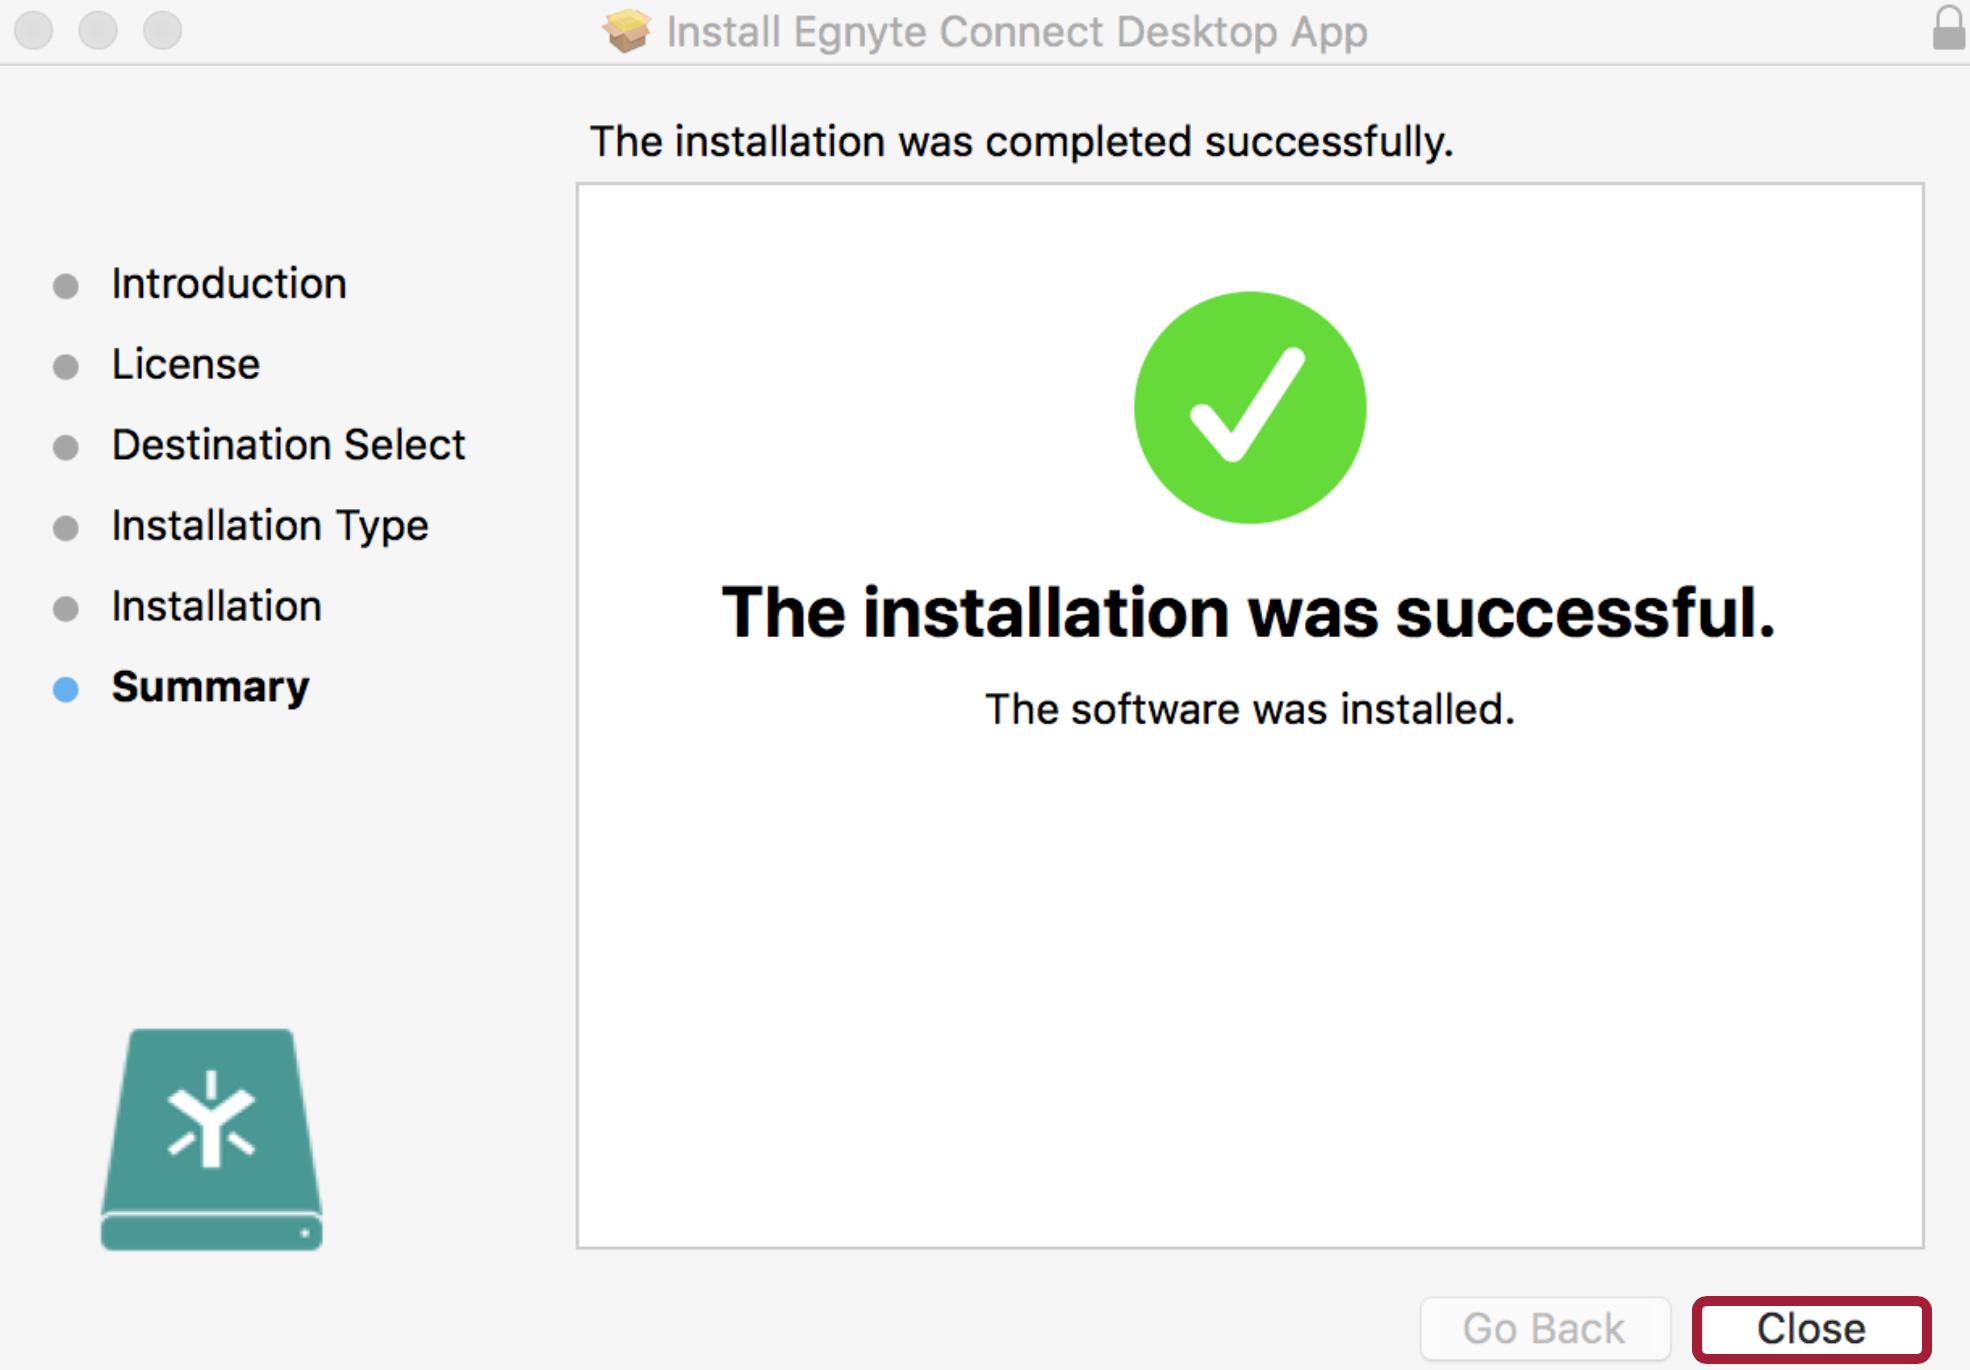 Desktop App for Mac Installation – Egnyte